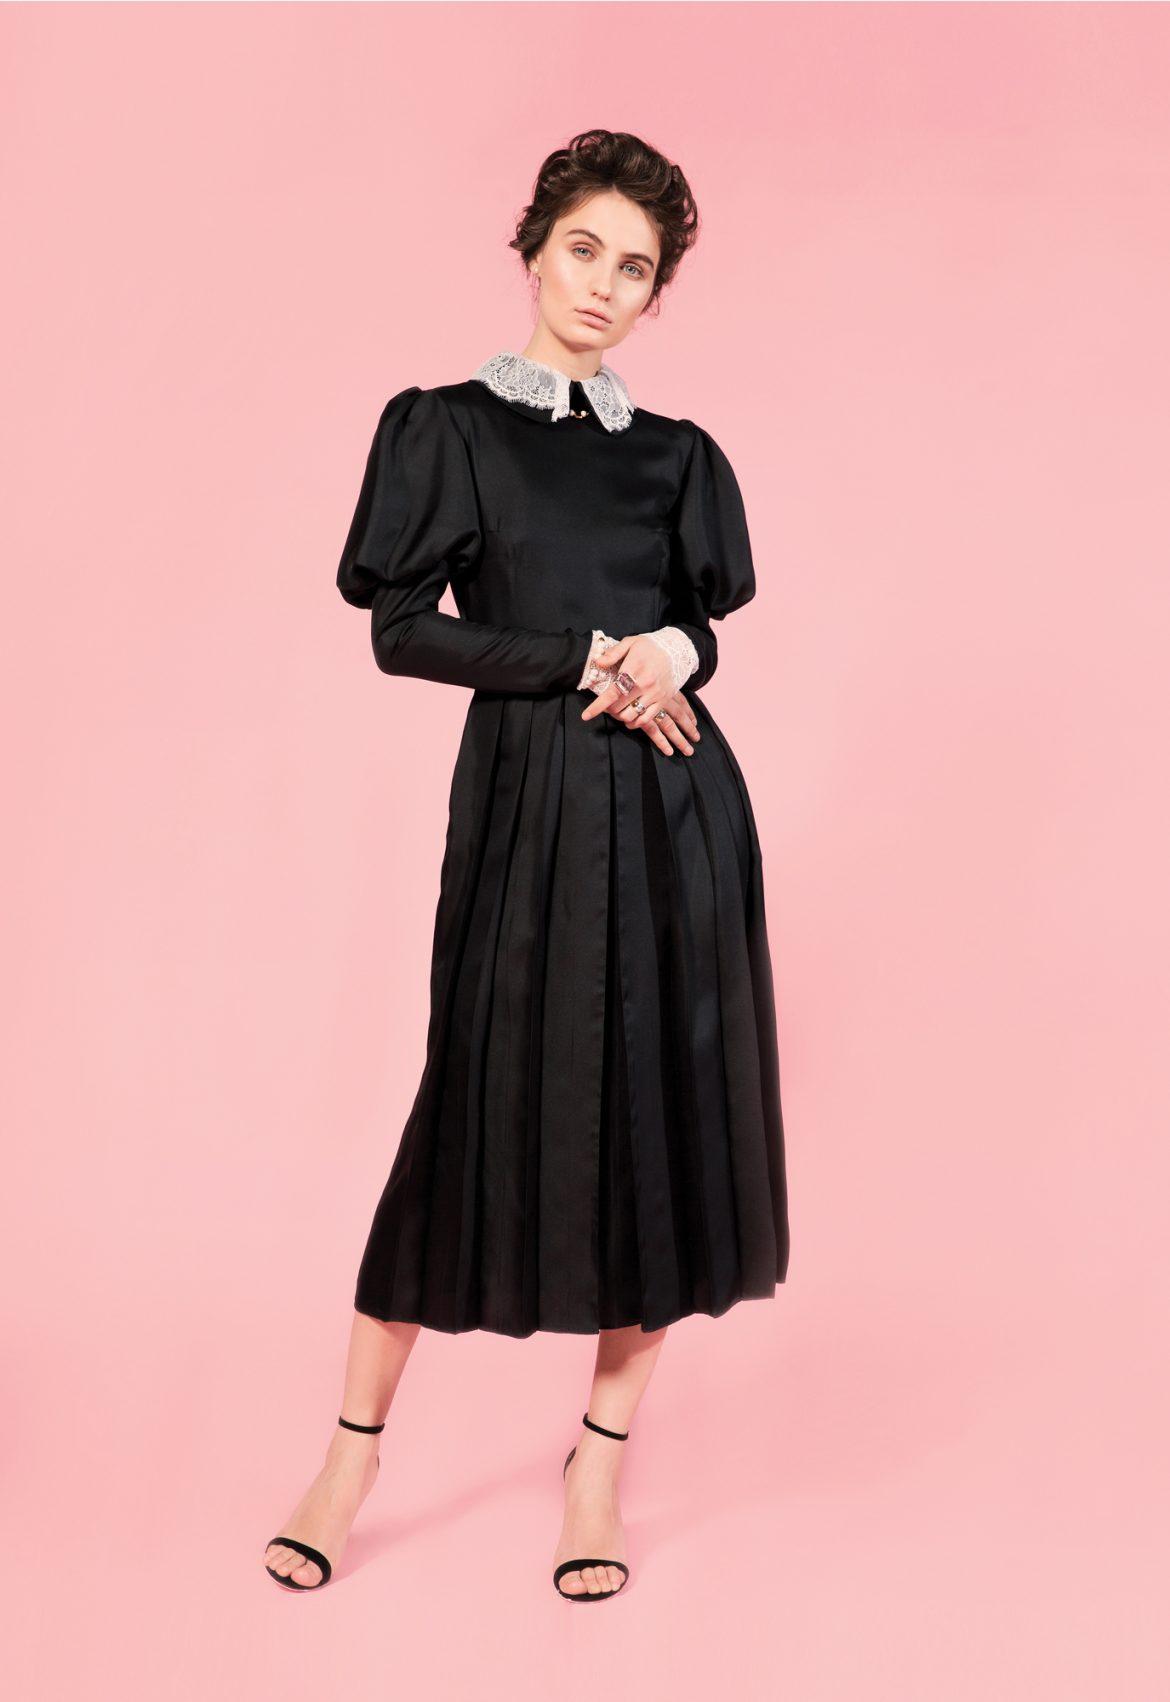 Eco-Fashion: Cel mai sanatos trend